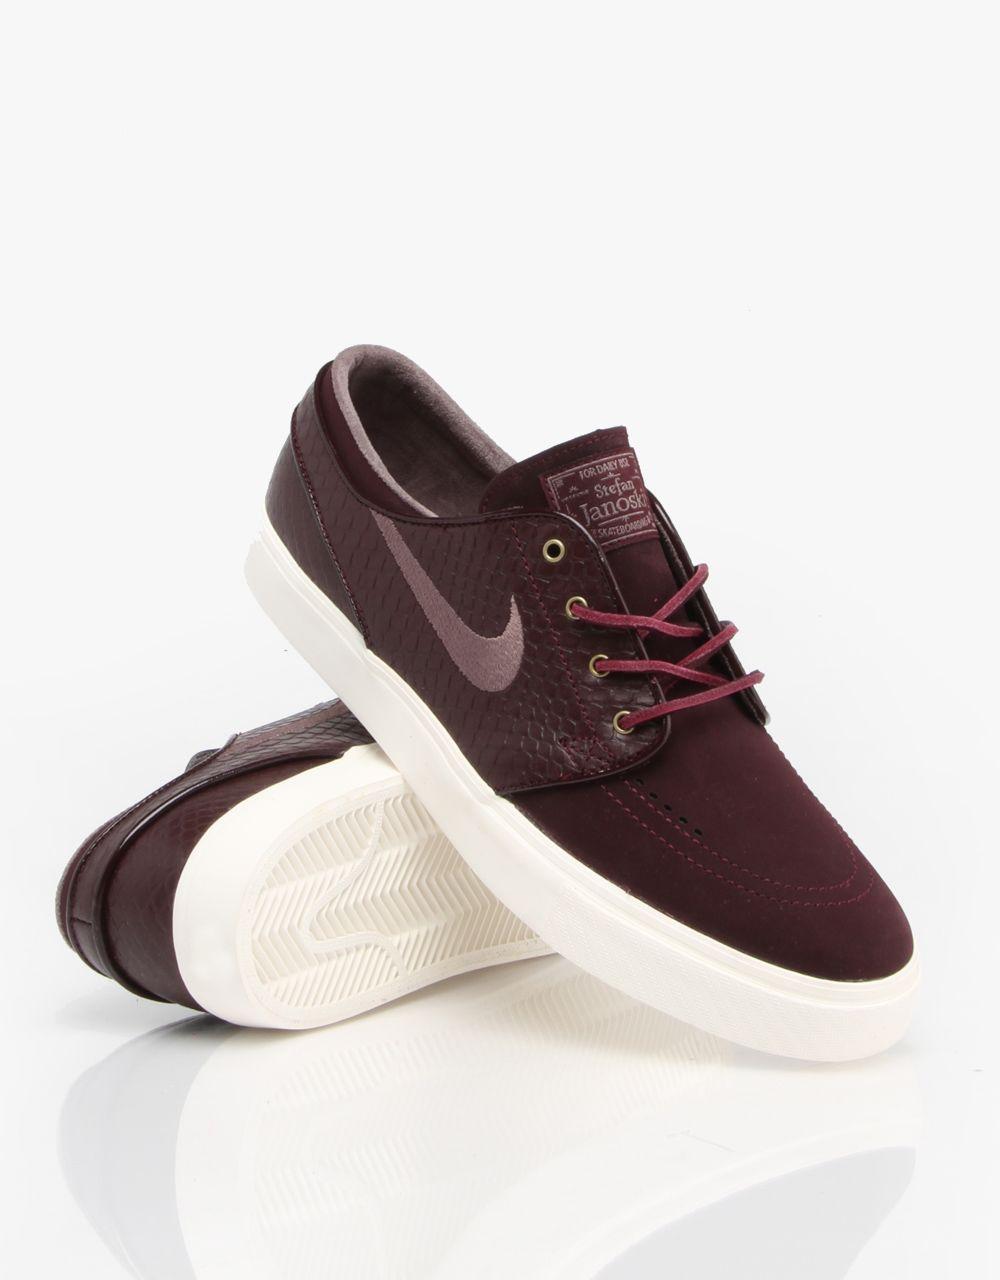 Nike SB Zoom Stefan Janoski Premium Skate Shoes - Deep Burgundy/Violet -  RouteOne.